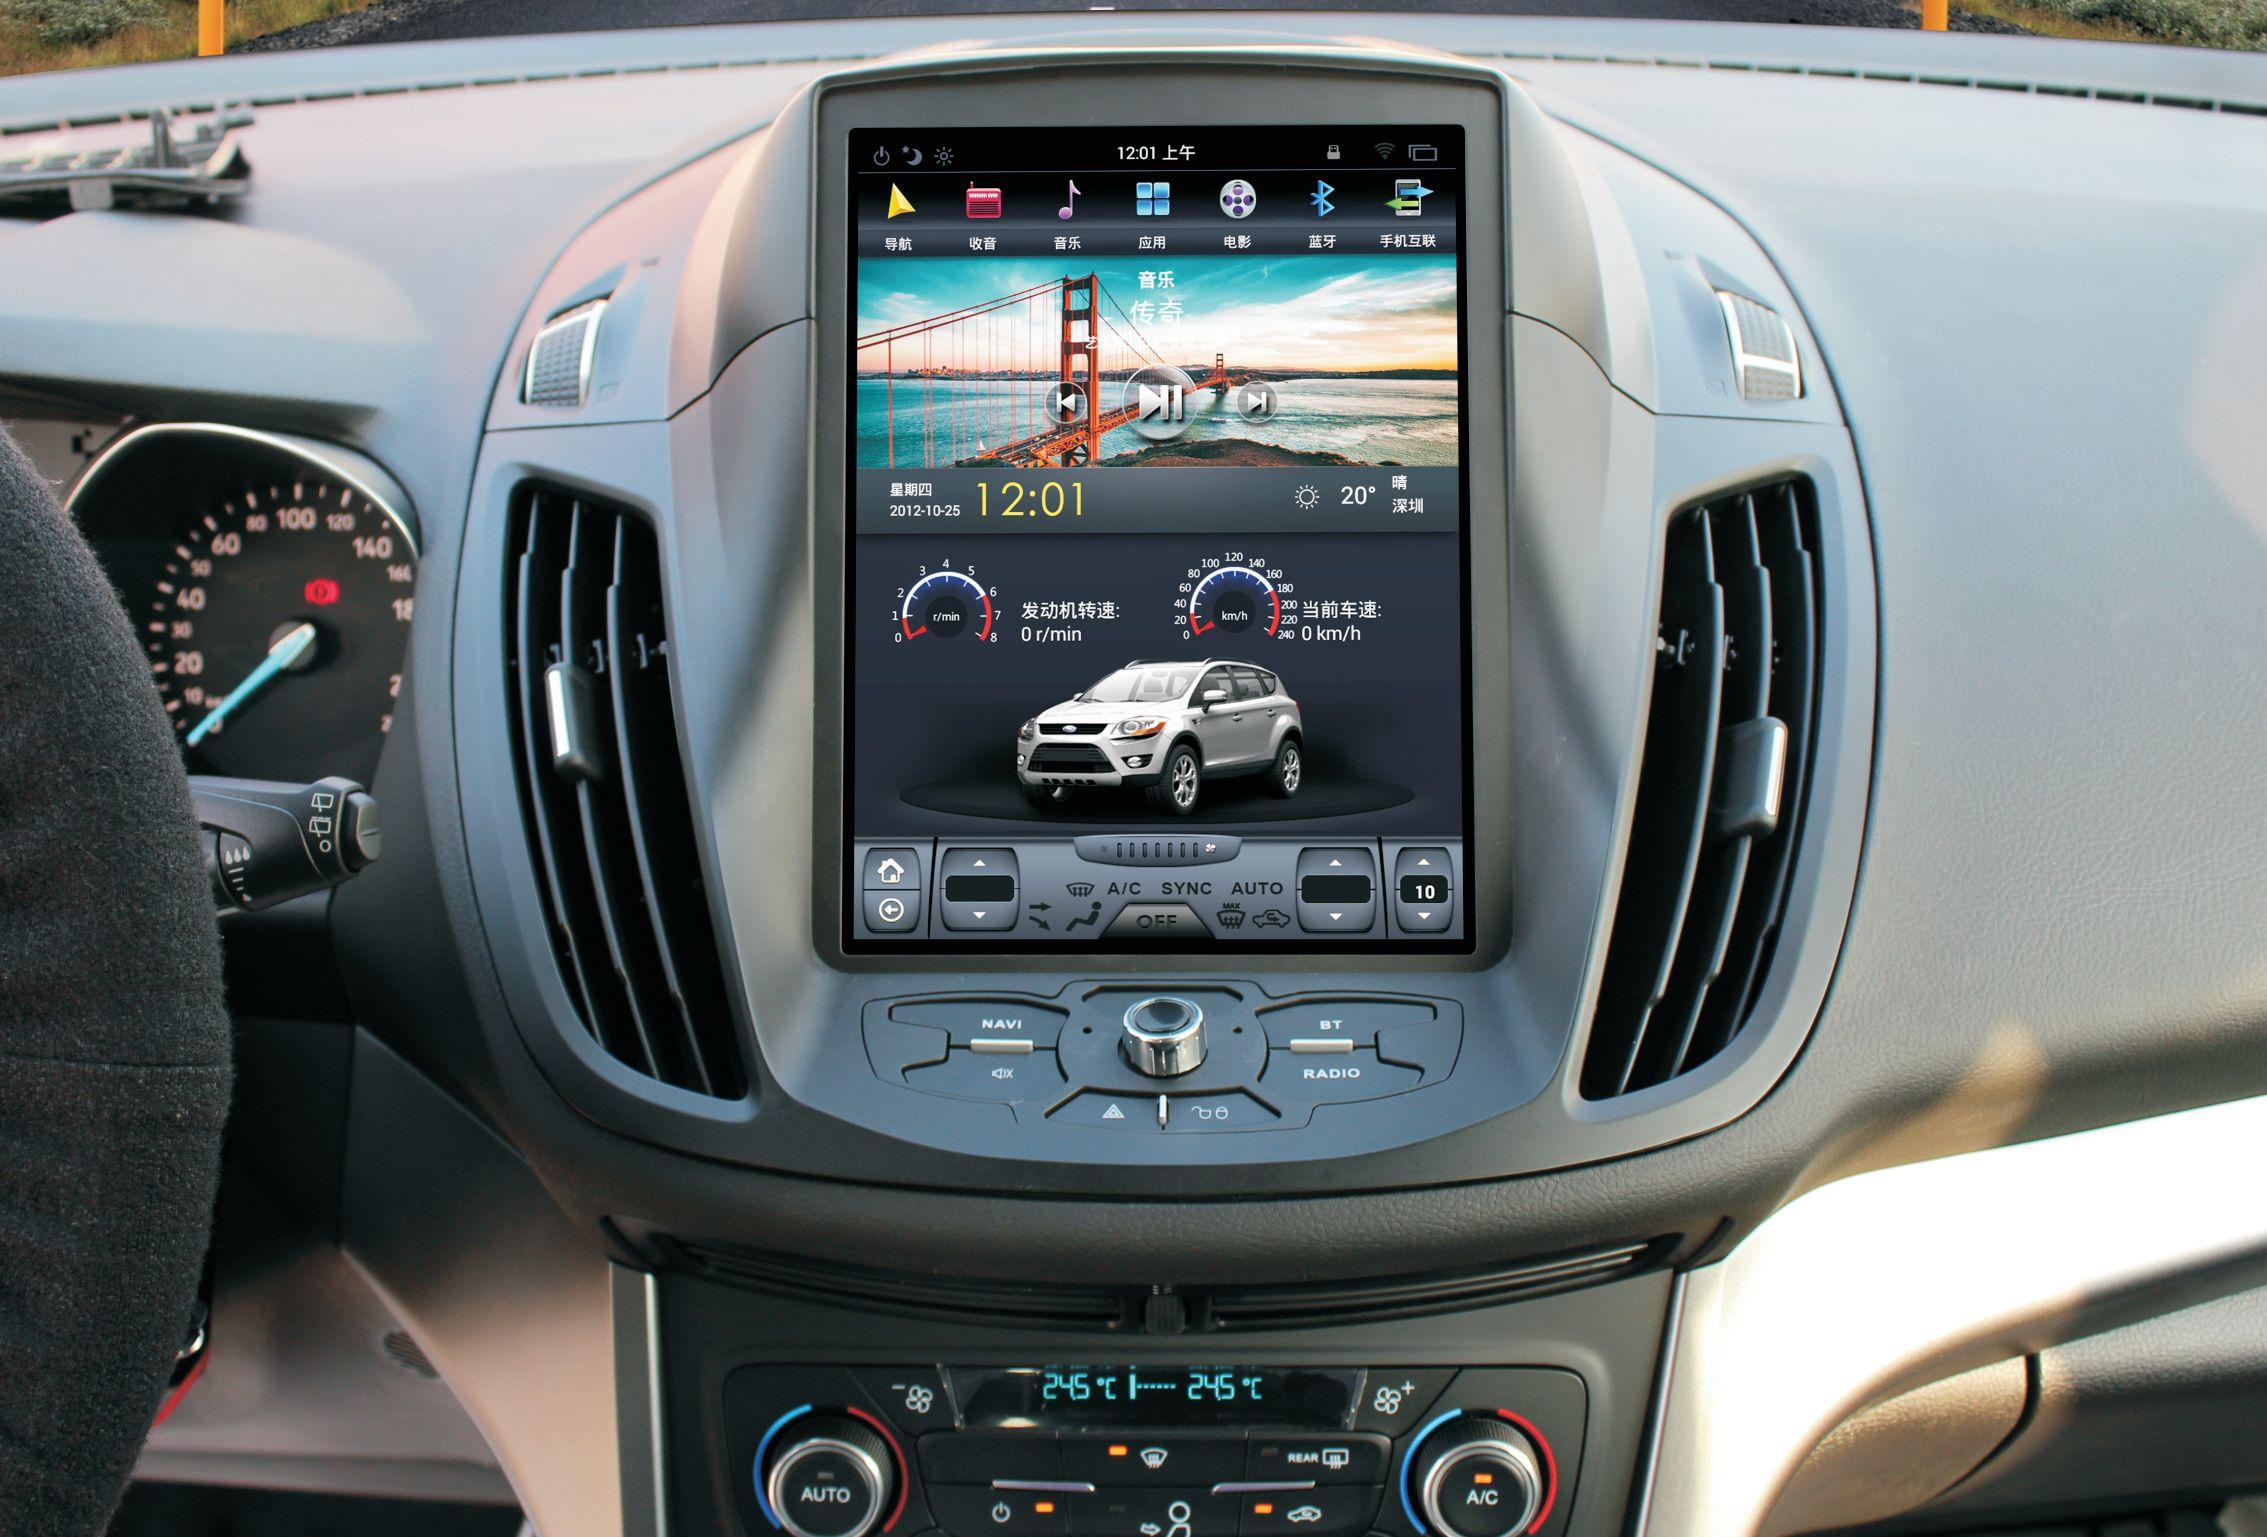 12 1 Tesla Vertical Screen Android Car Multimedia Gps Navigation